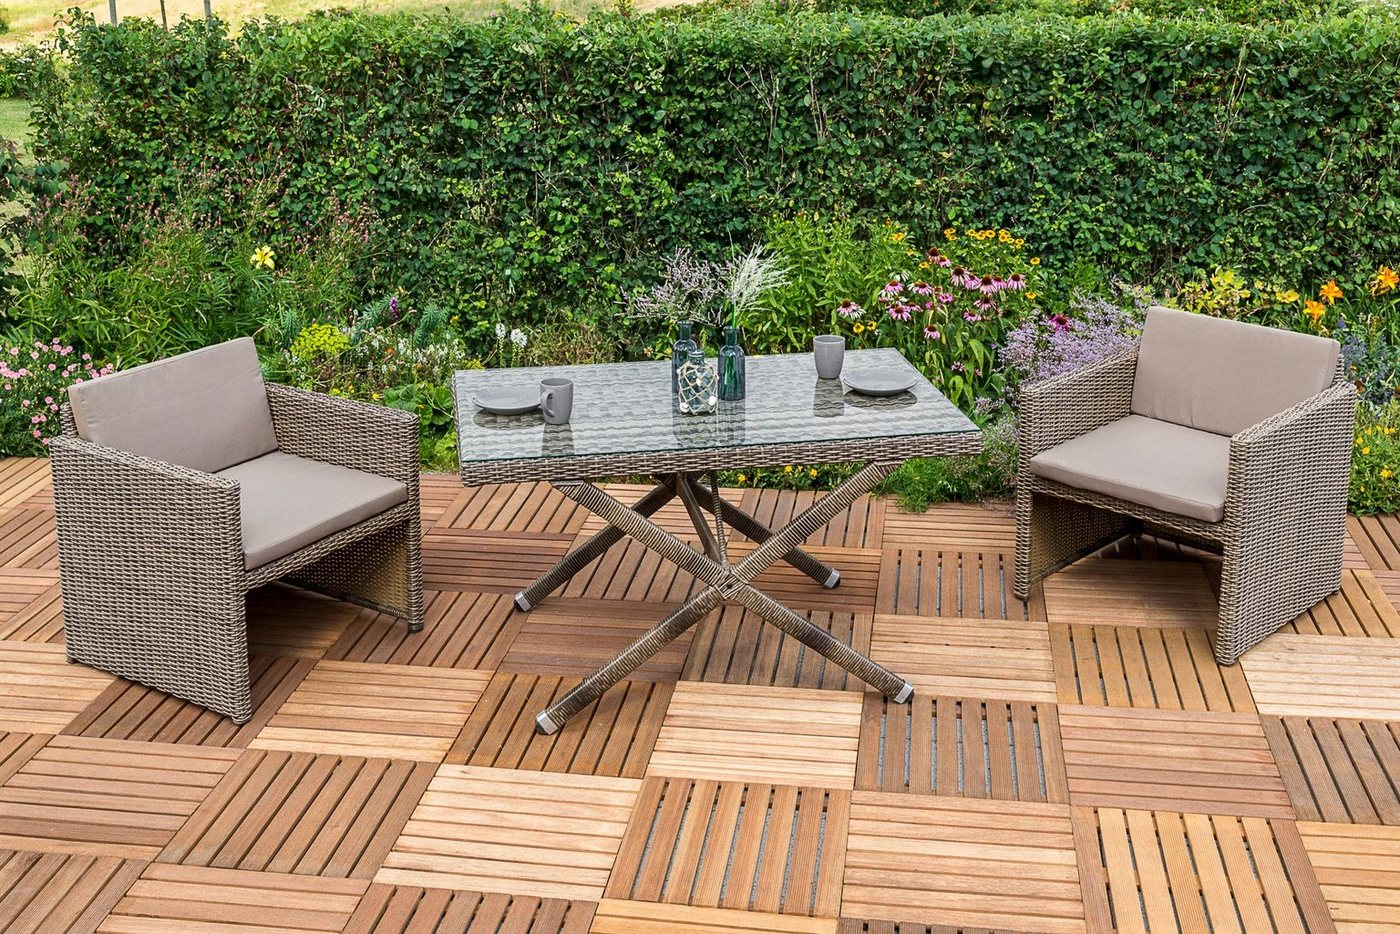 MERXX Tuinmeubelset Avola, 7-dlg., 2 stoelen, tafel 130x80 cm, poly-rotan, naturel